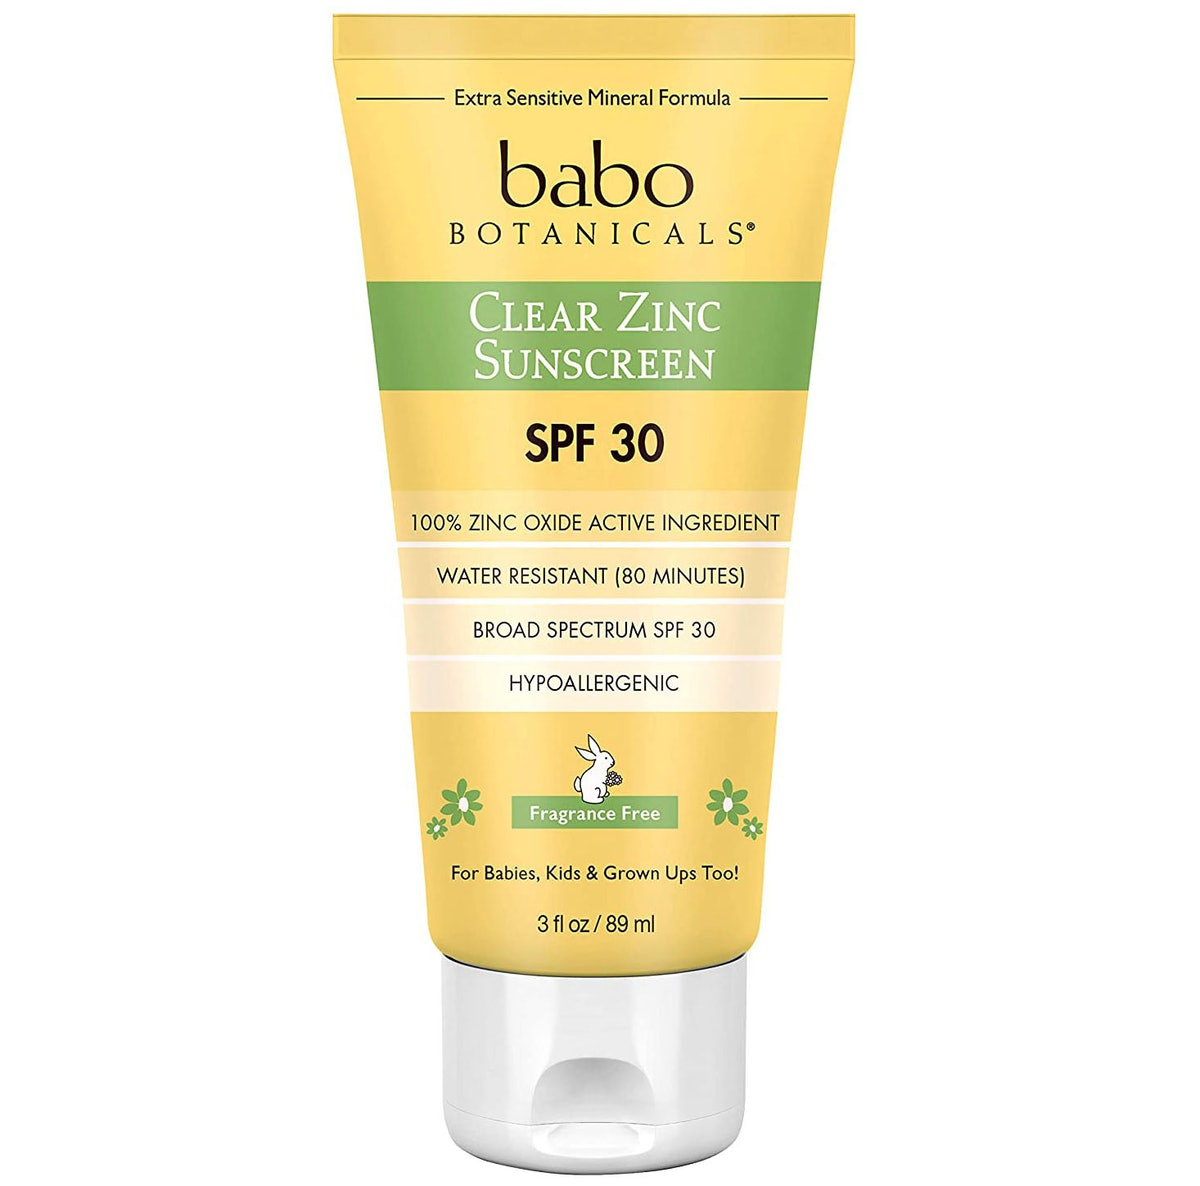 Babo Botanicals Zinc Sunscreen Lotion SPF 30